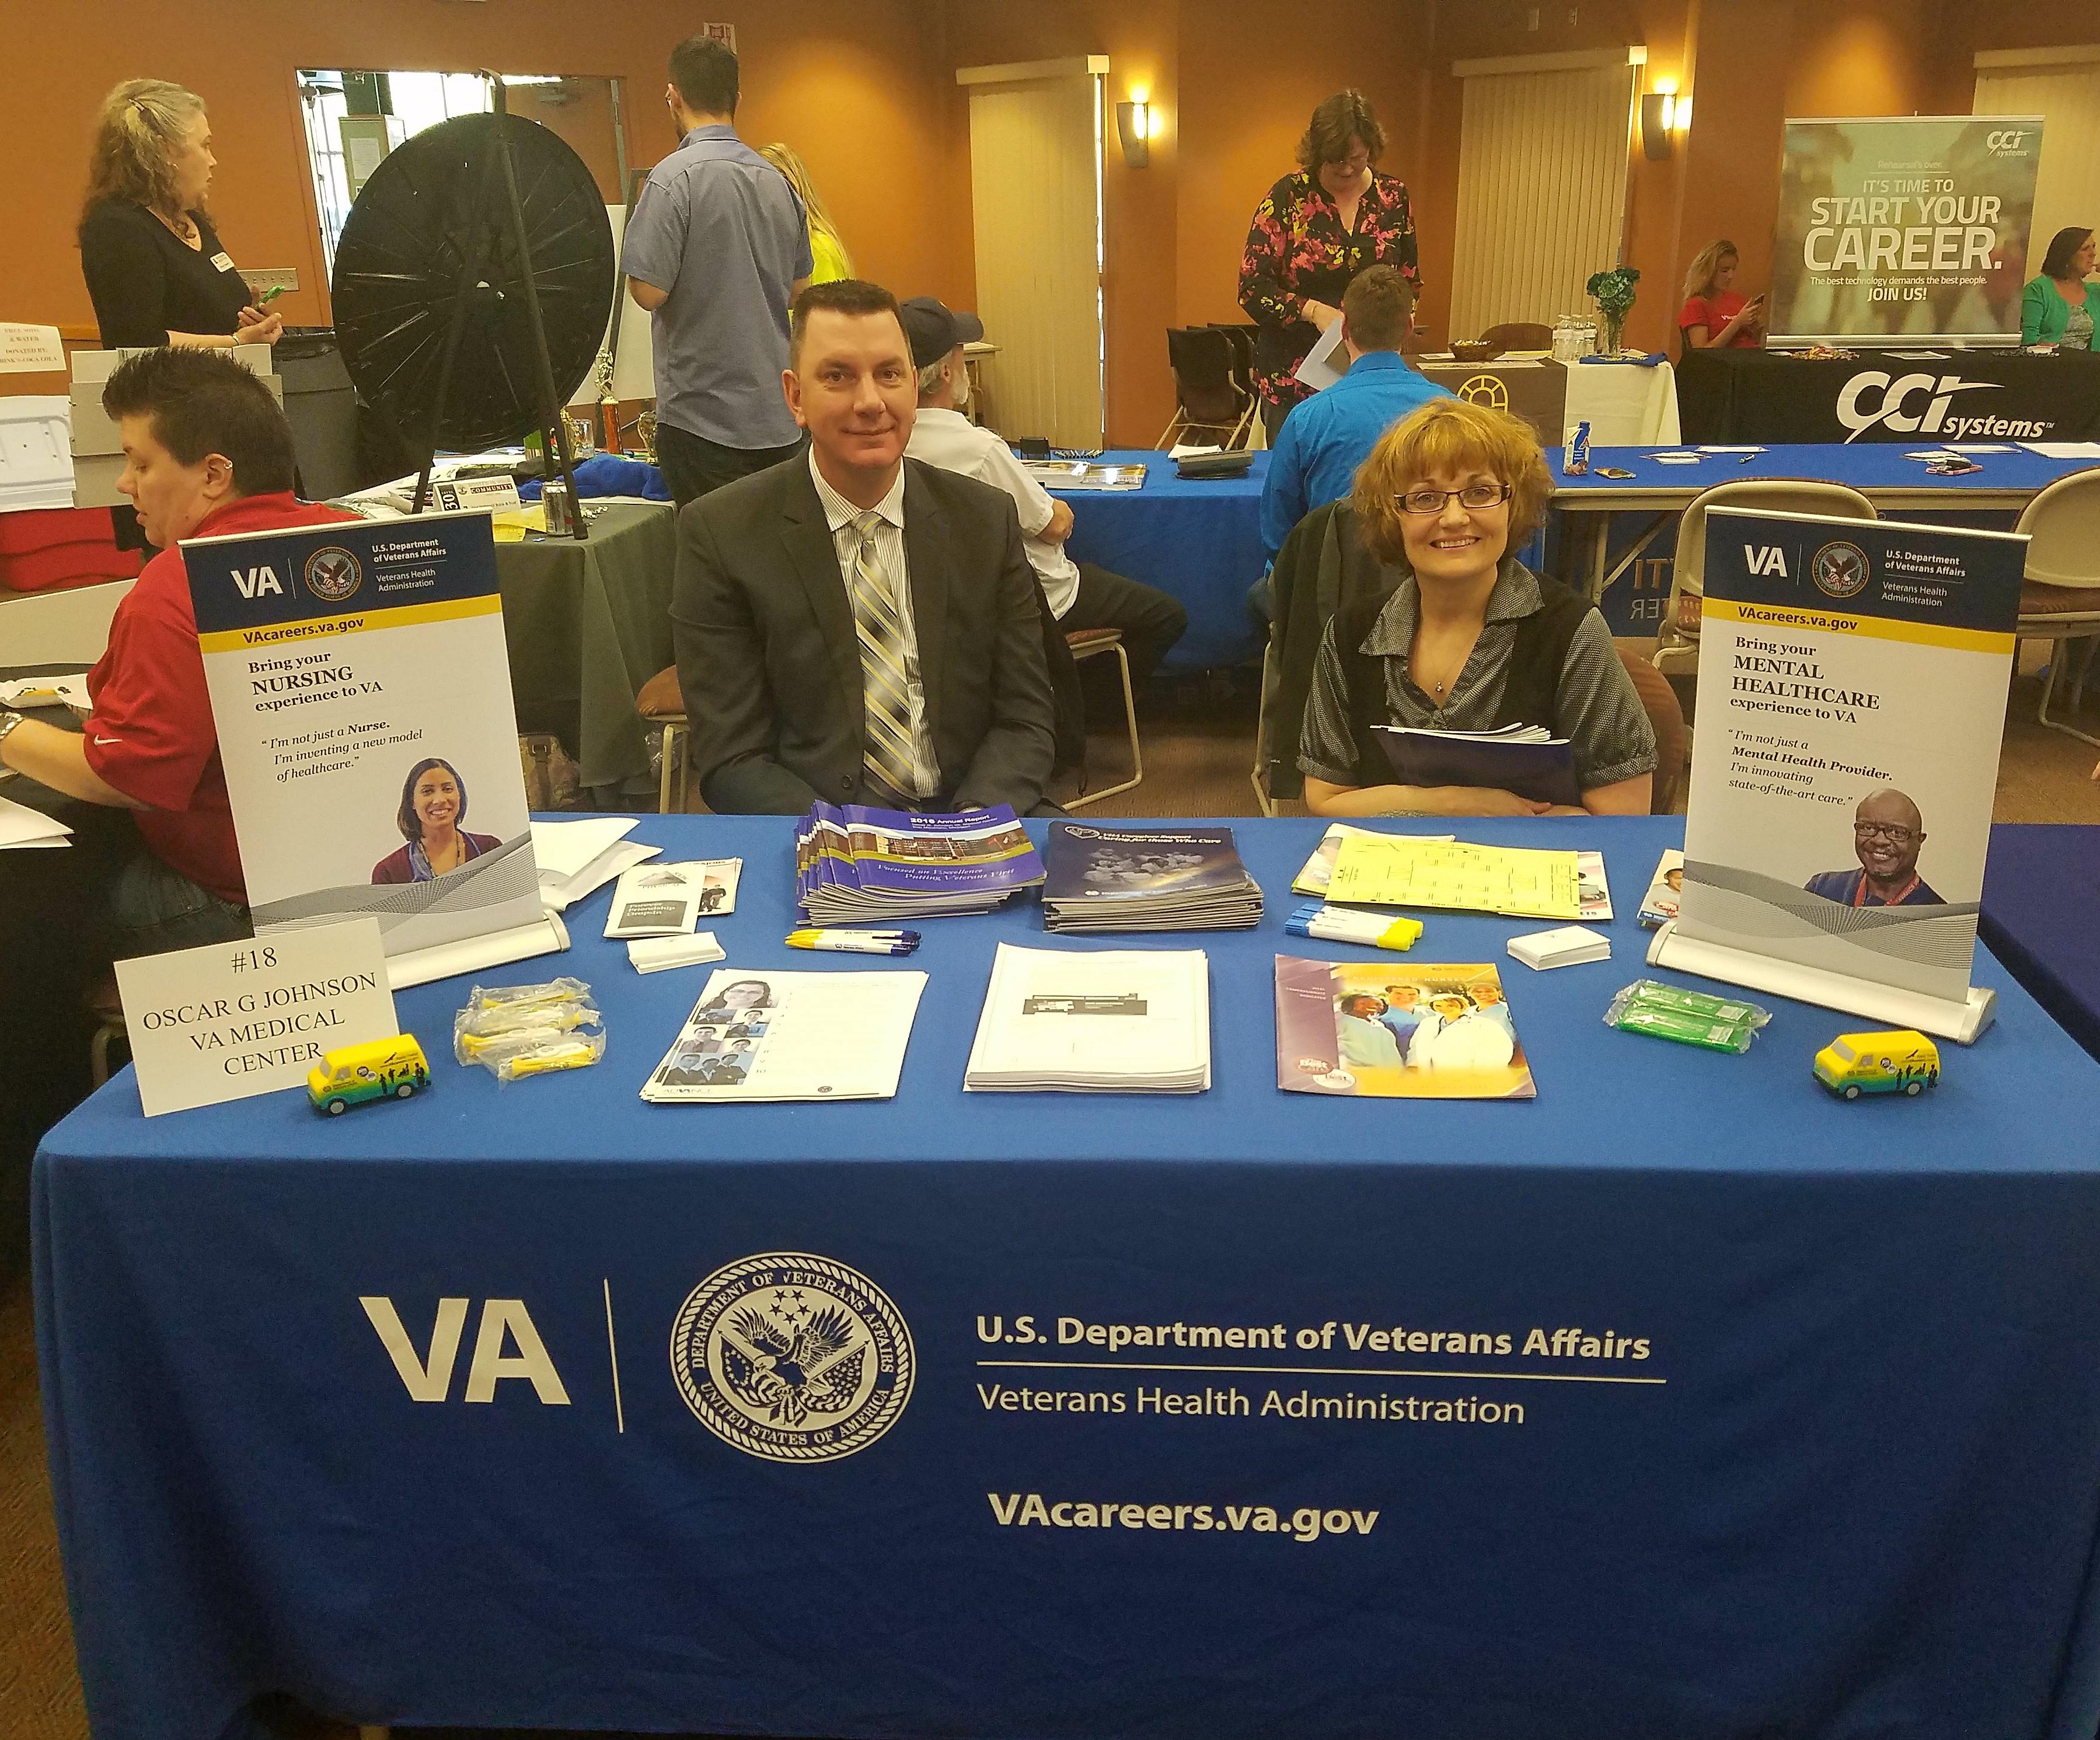 VA Medical Center Expo